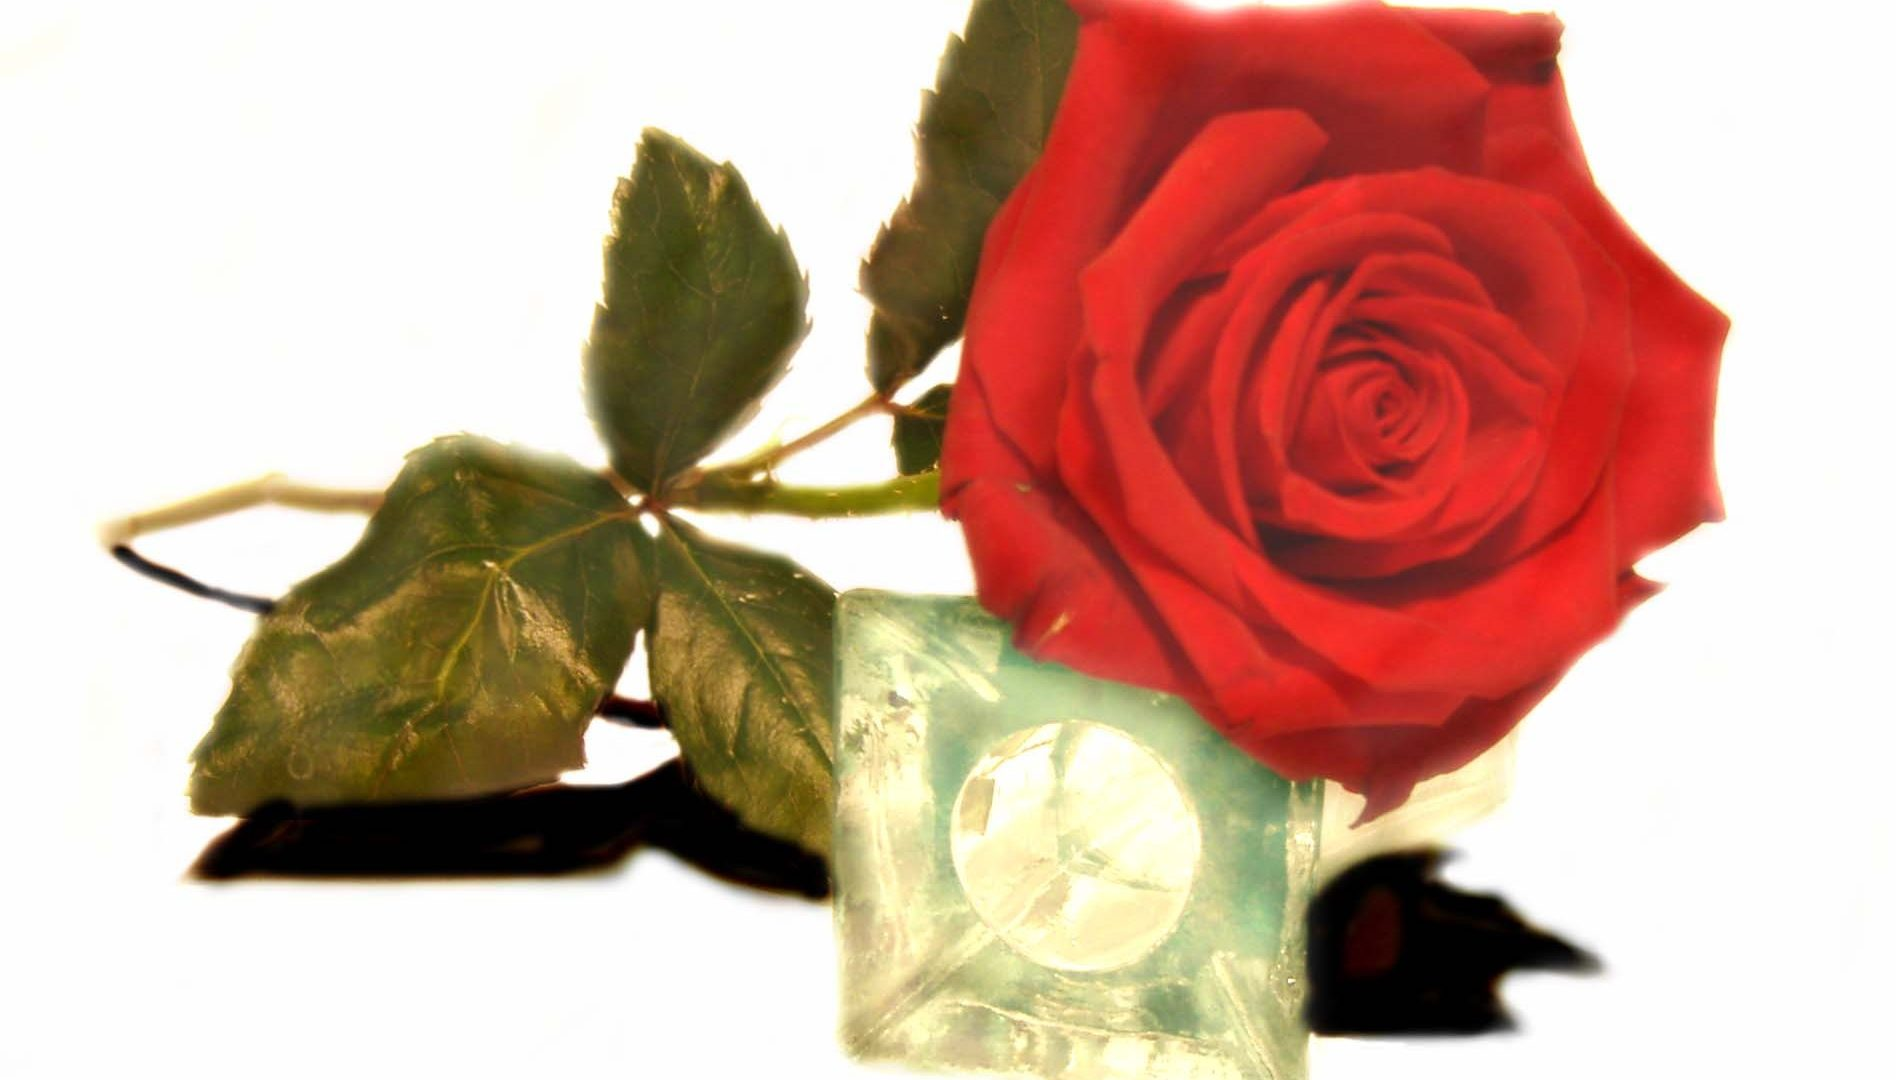 Fresh Love Lovely Single Imaginary Passion Nature Rose